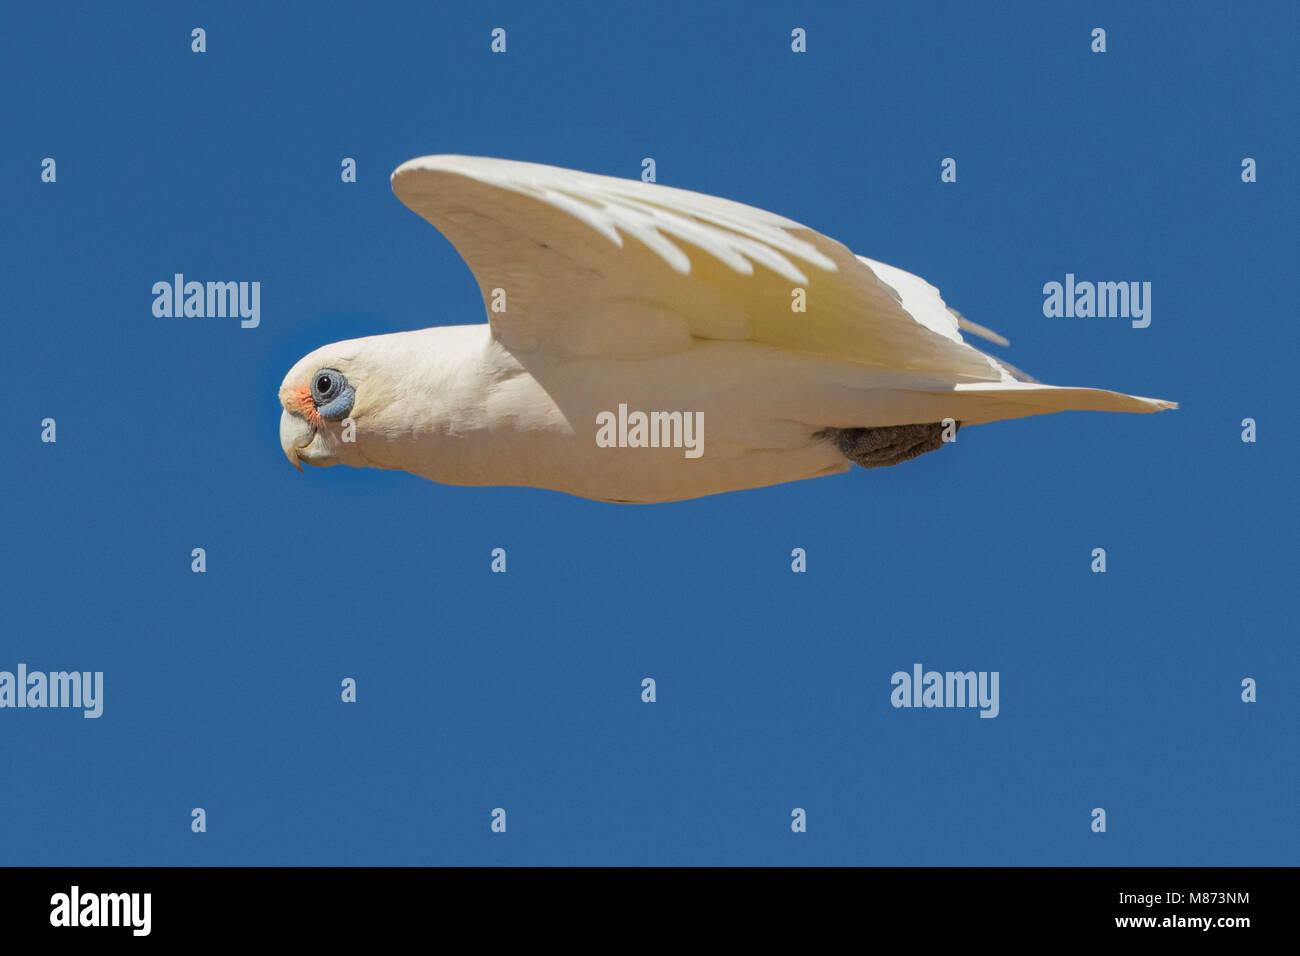 Little corella in flight - Stock Image